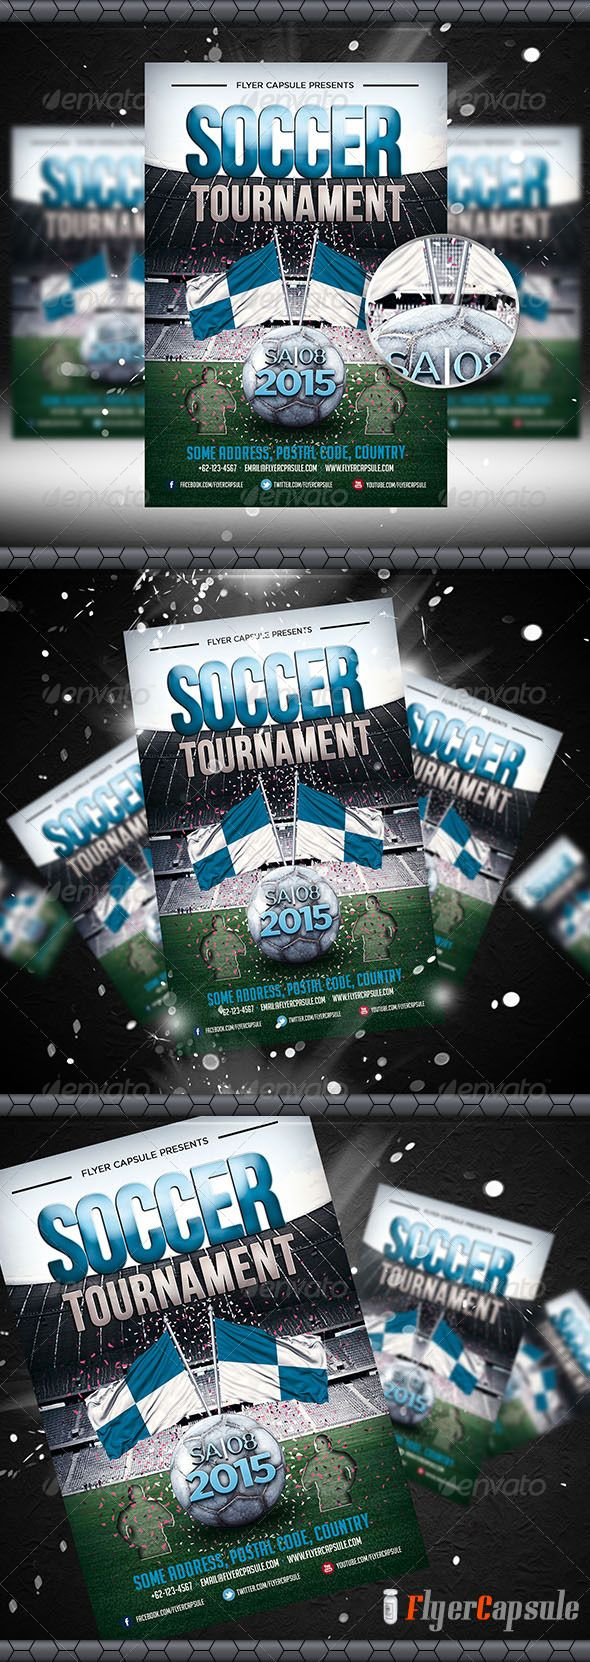 Soccer Tournament Flyer Template Graphicriver Soccer Tournament